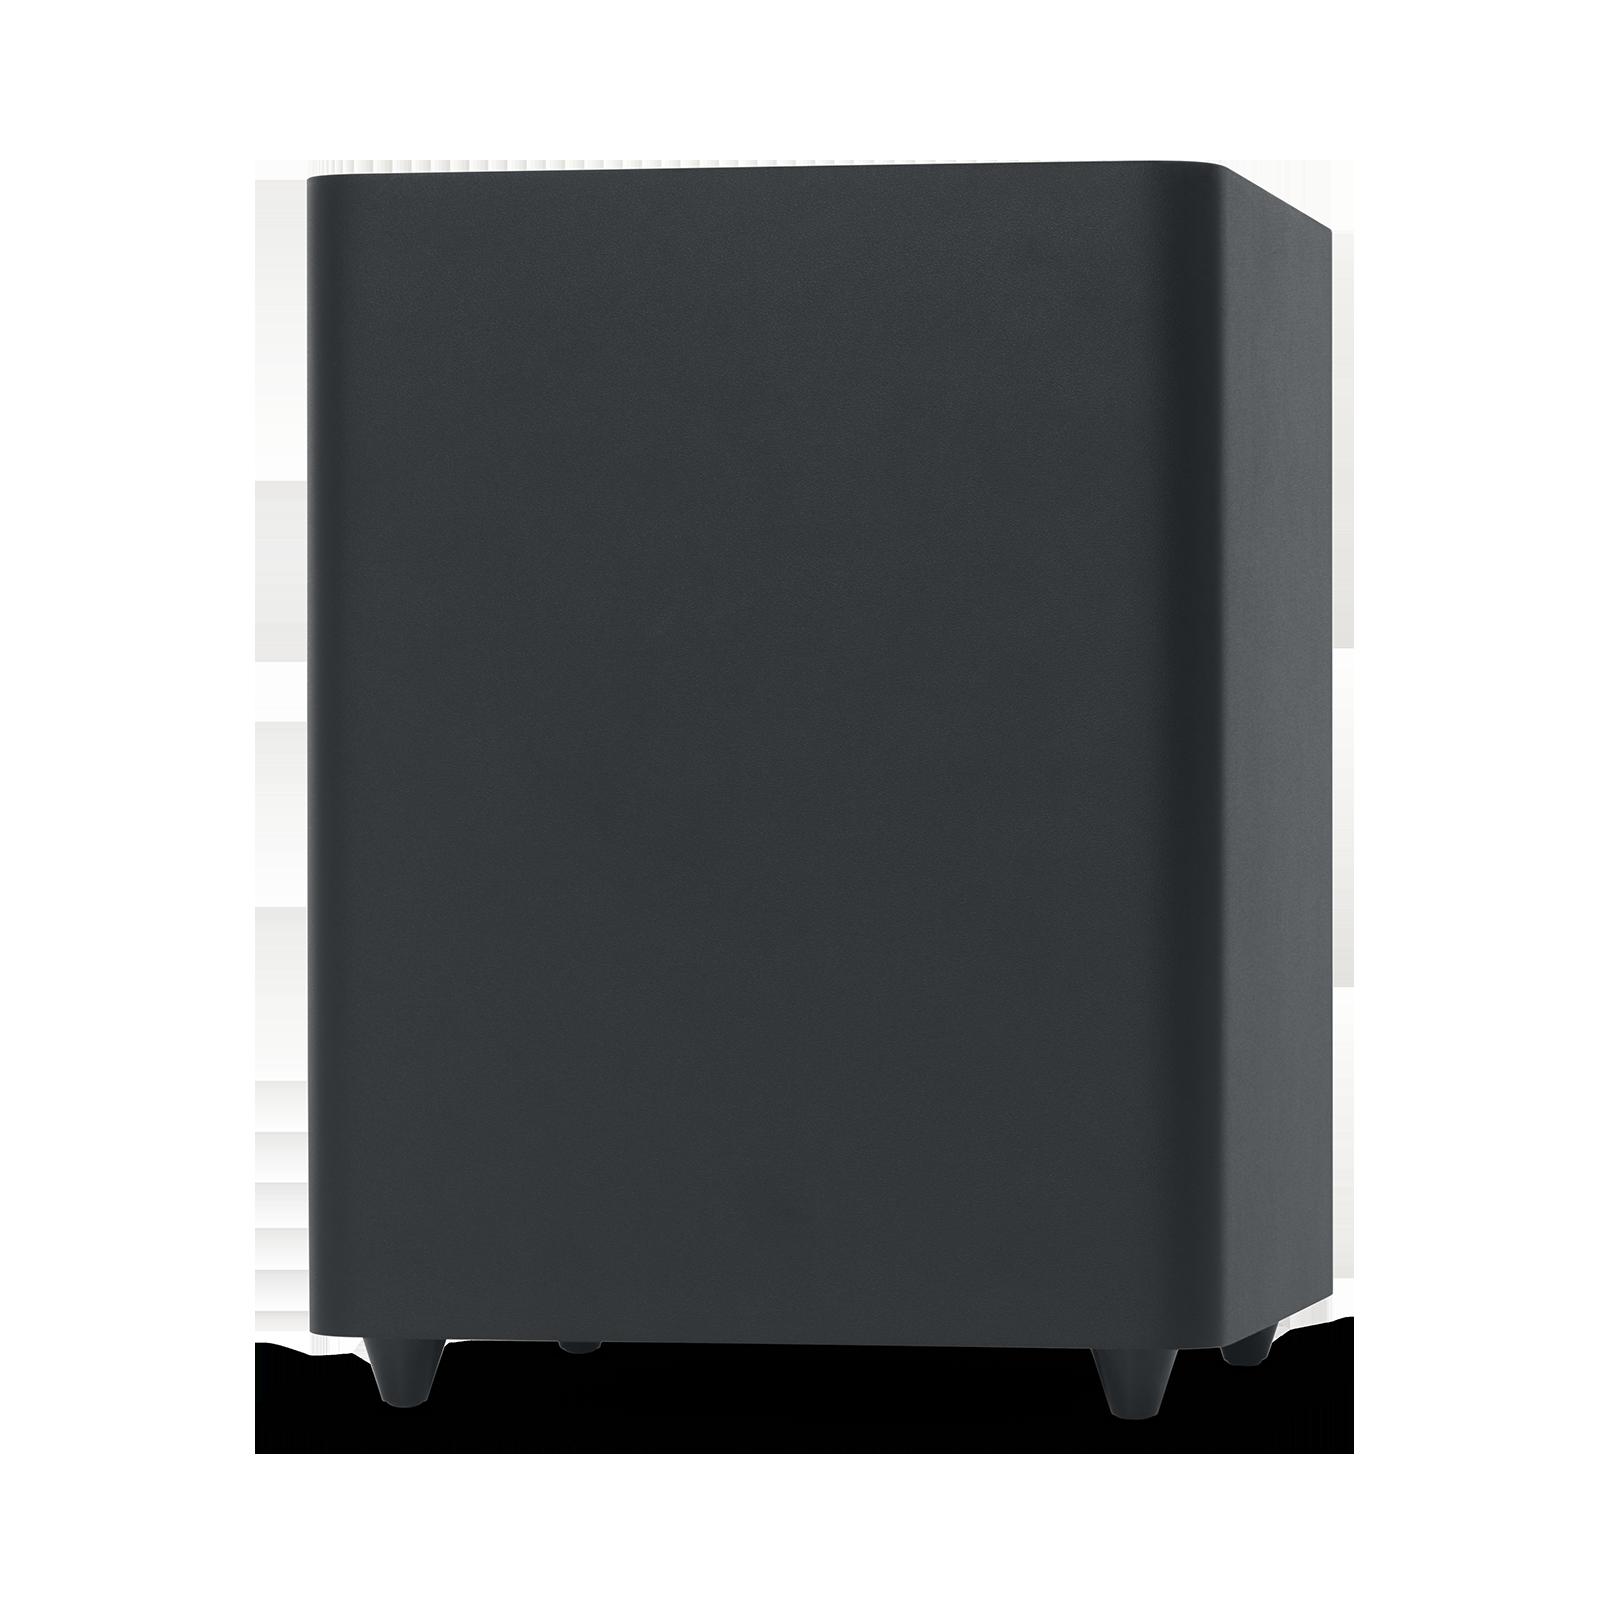 HK SB20 - Black - Advanced soundbar with Bluetooth and powerful wireless subwoofer - Detailshot 6